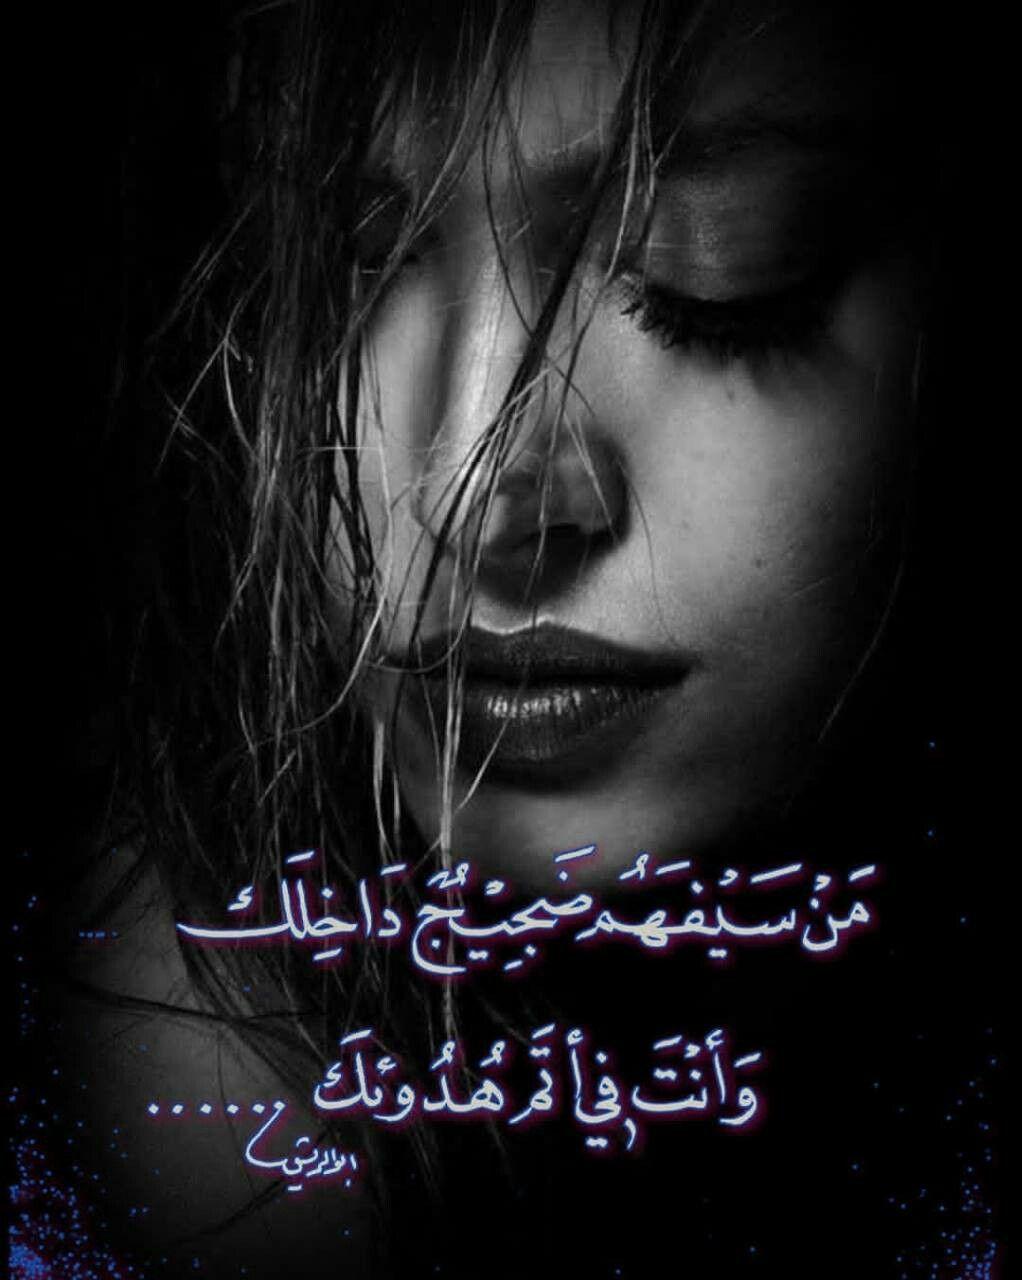 Pin By شاهينة الجبل On همس المشاعر Movie Posters Movies Poster